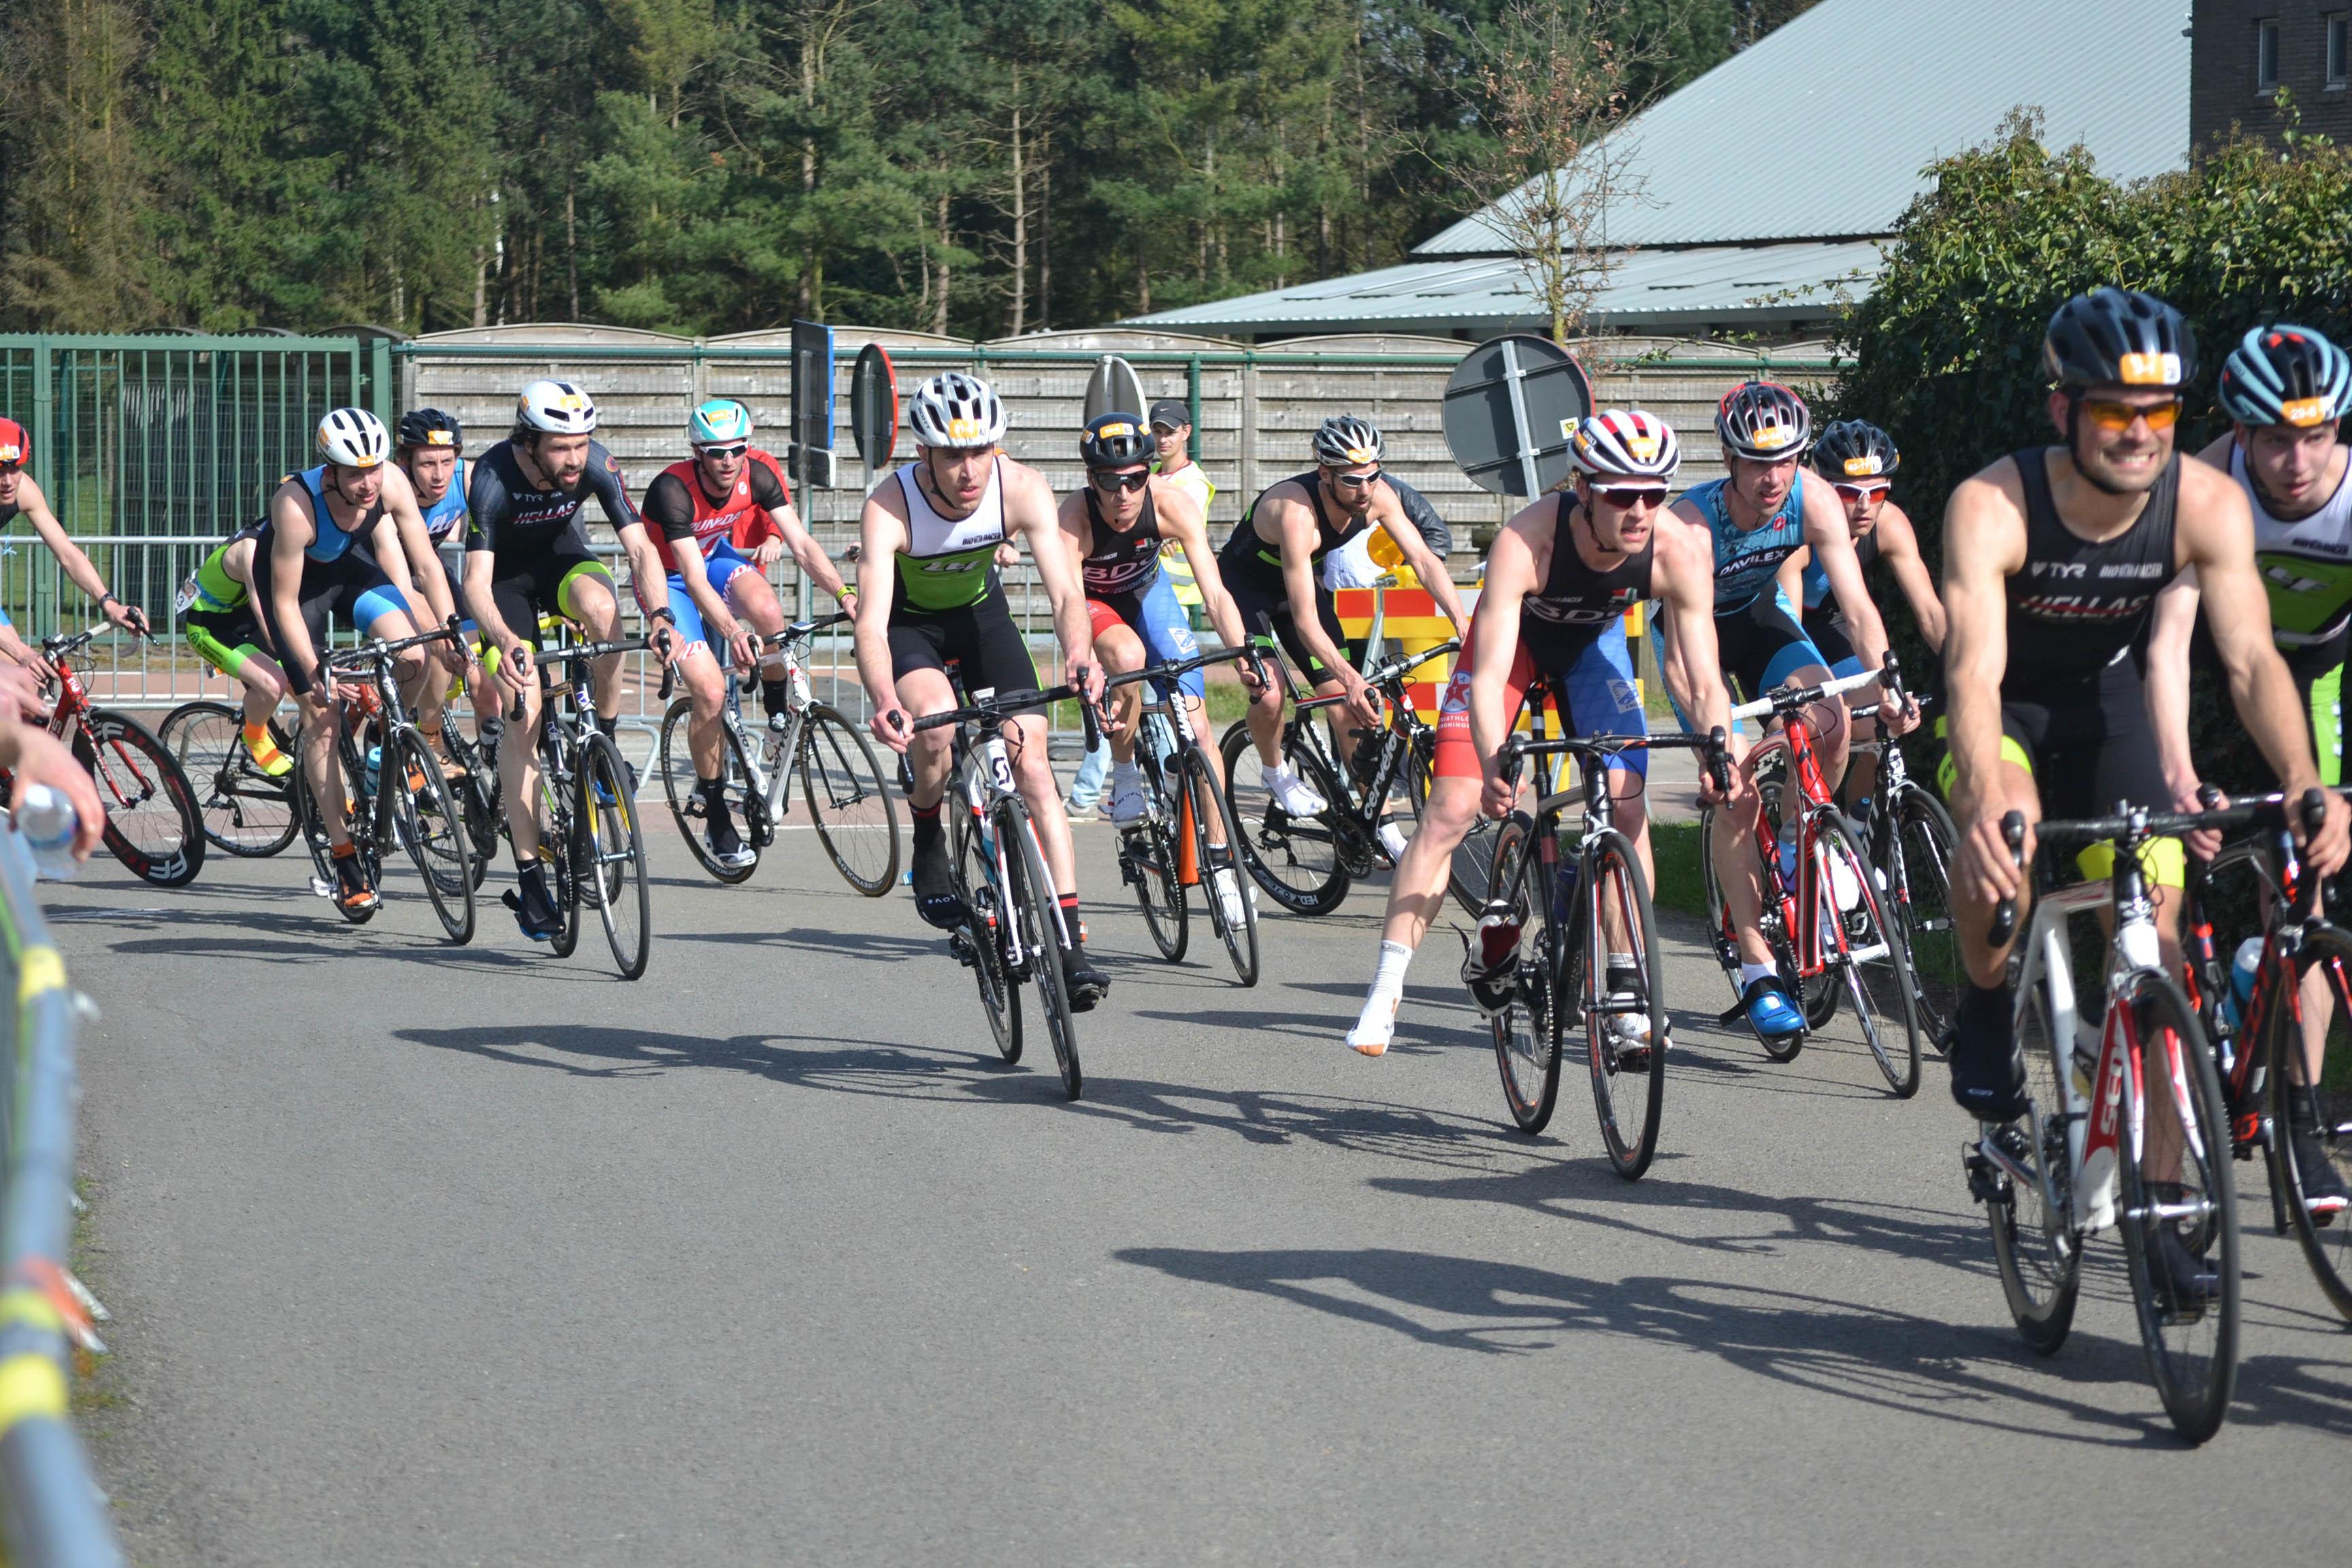 competitie - UHTT Run Bike Run Team Geel 1 - UHTT Run Bike Run Team verrassend 11e in Challenge Duathlon Geel - raceverslag, Nederland, Hardlopen, Fietsen, competitie, 2018